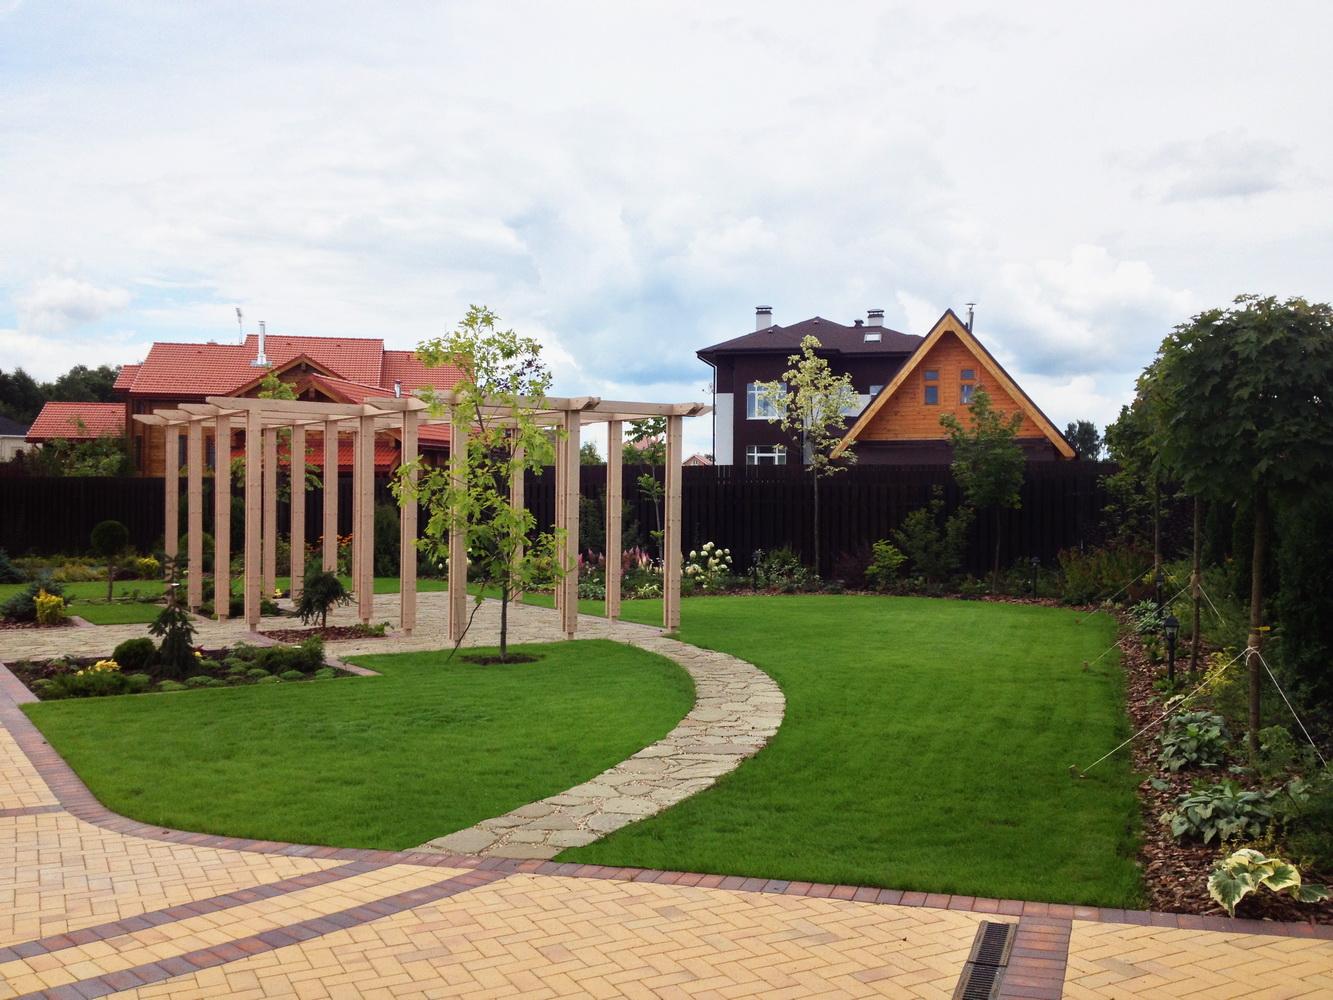 Зона отдыха, Площадки, Дизайн сада